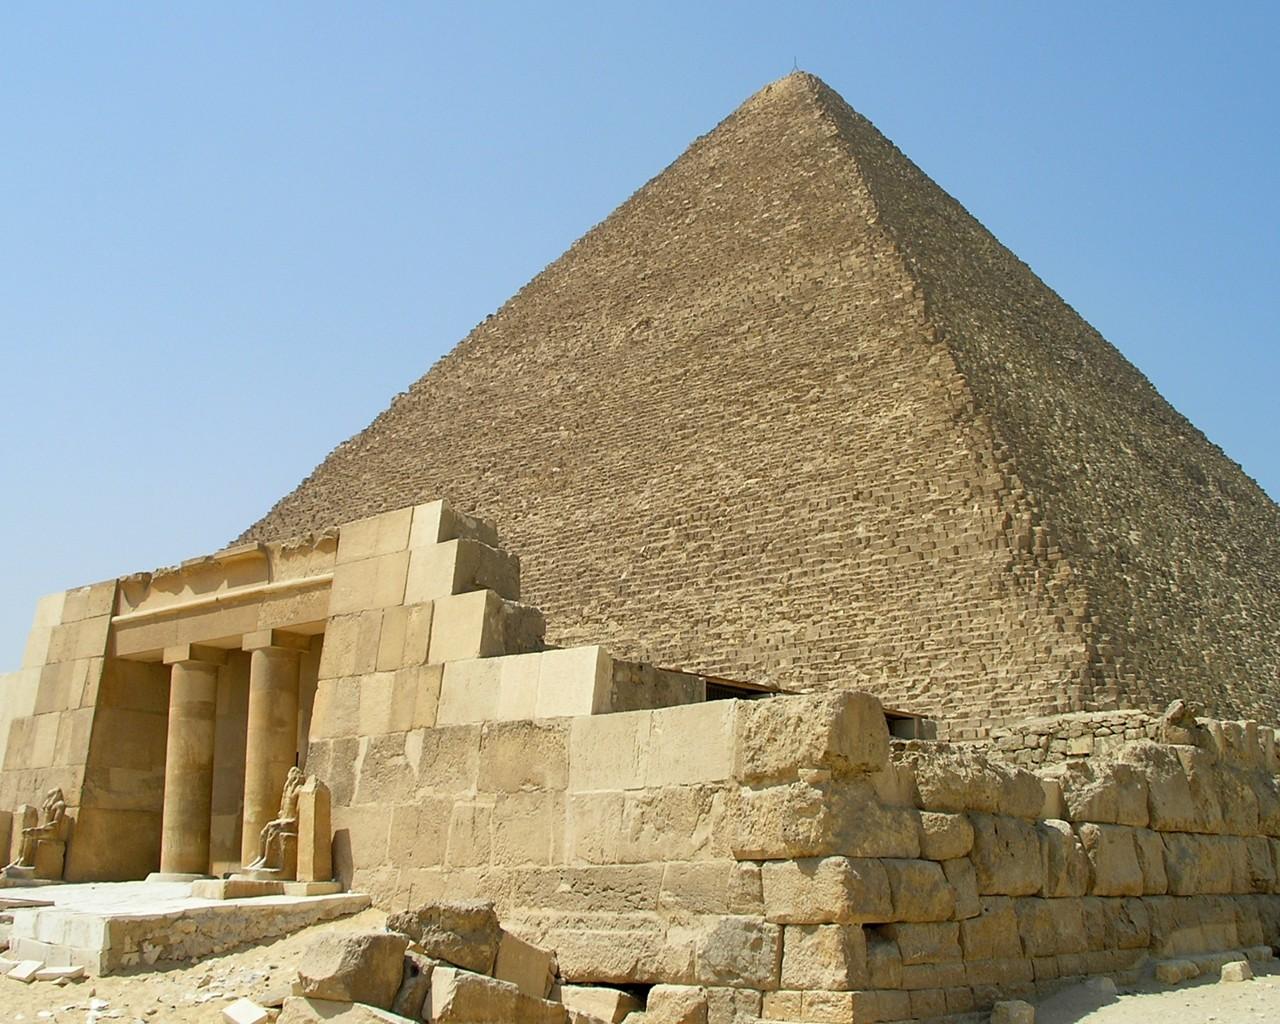 las piramide por dentro: